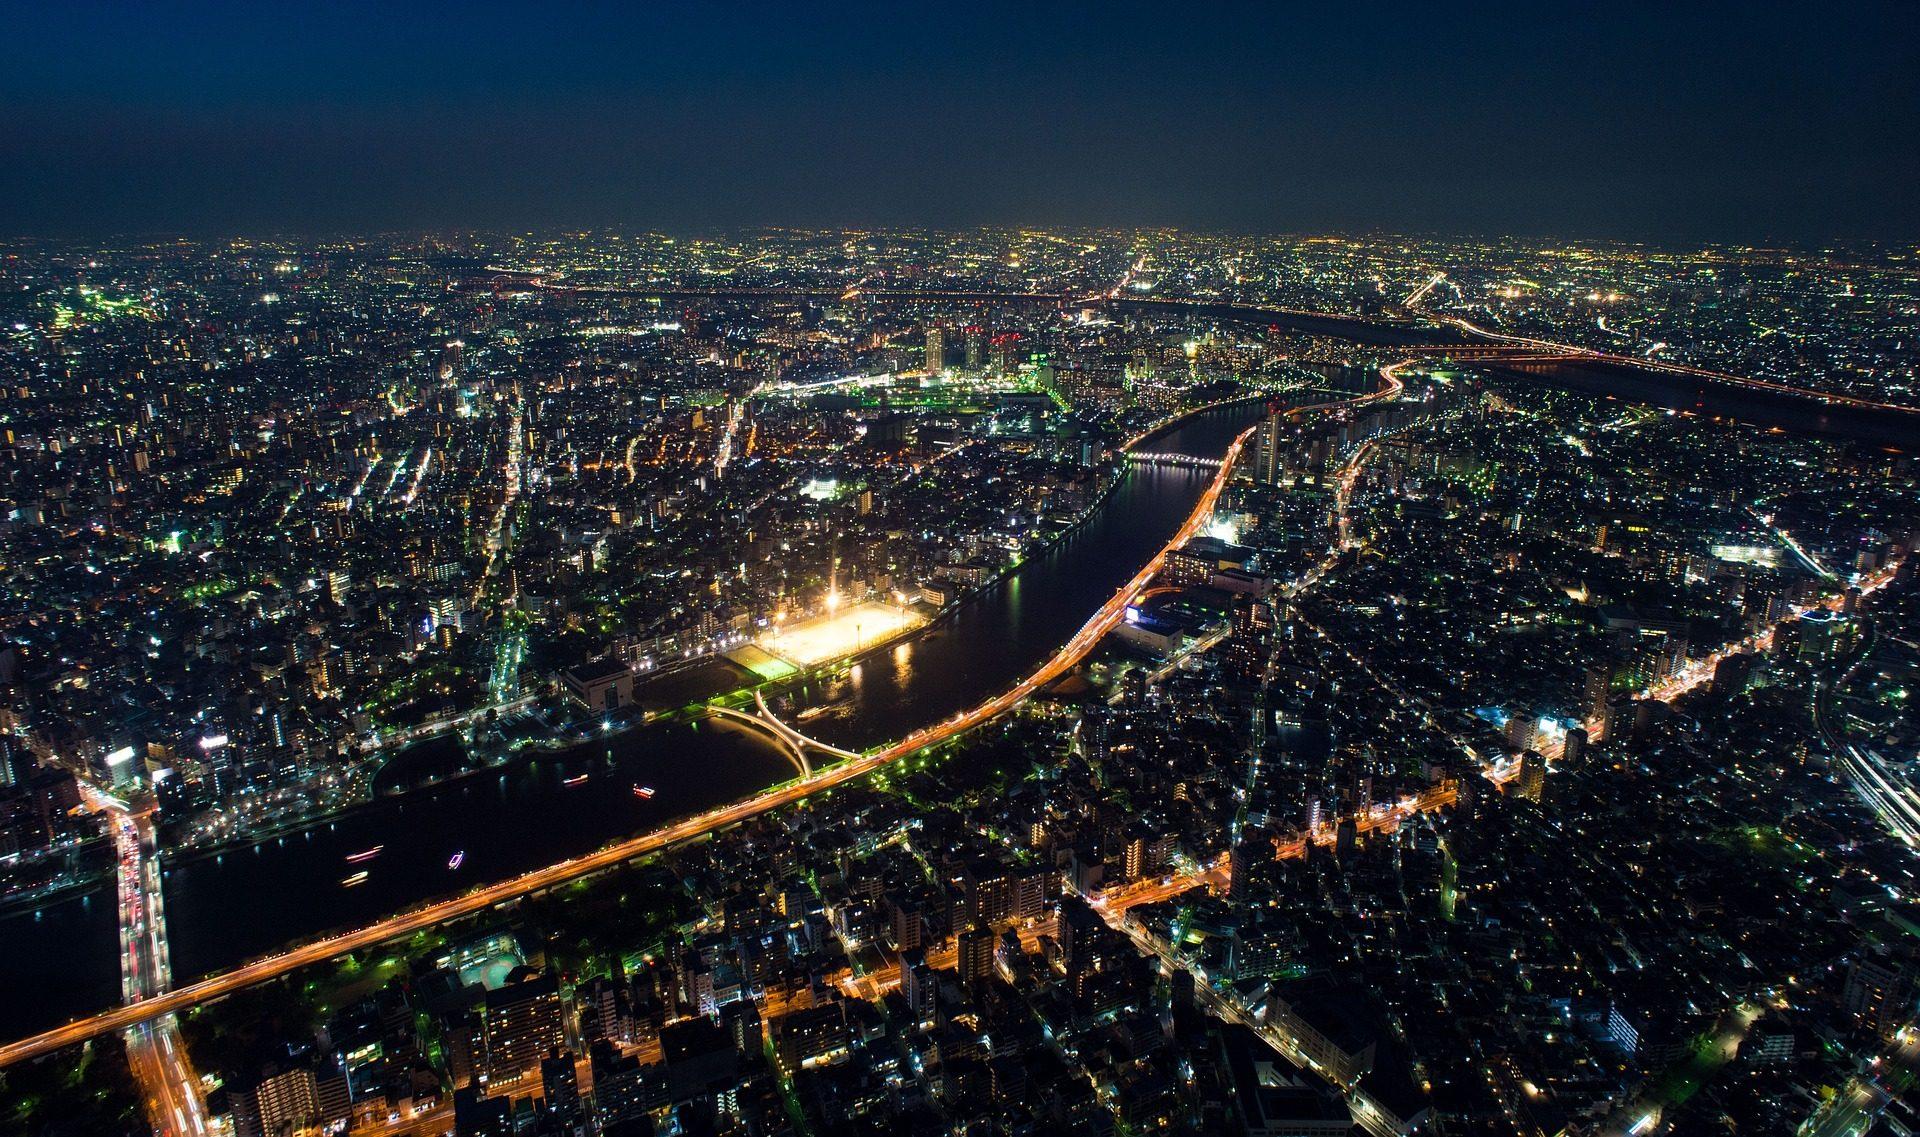 Stadt, Nacht, Höhen, Lichter, Gebäude, Überbevölkerung - Wallpaper HD - Prof.-falken.com